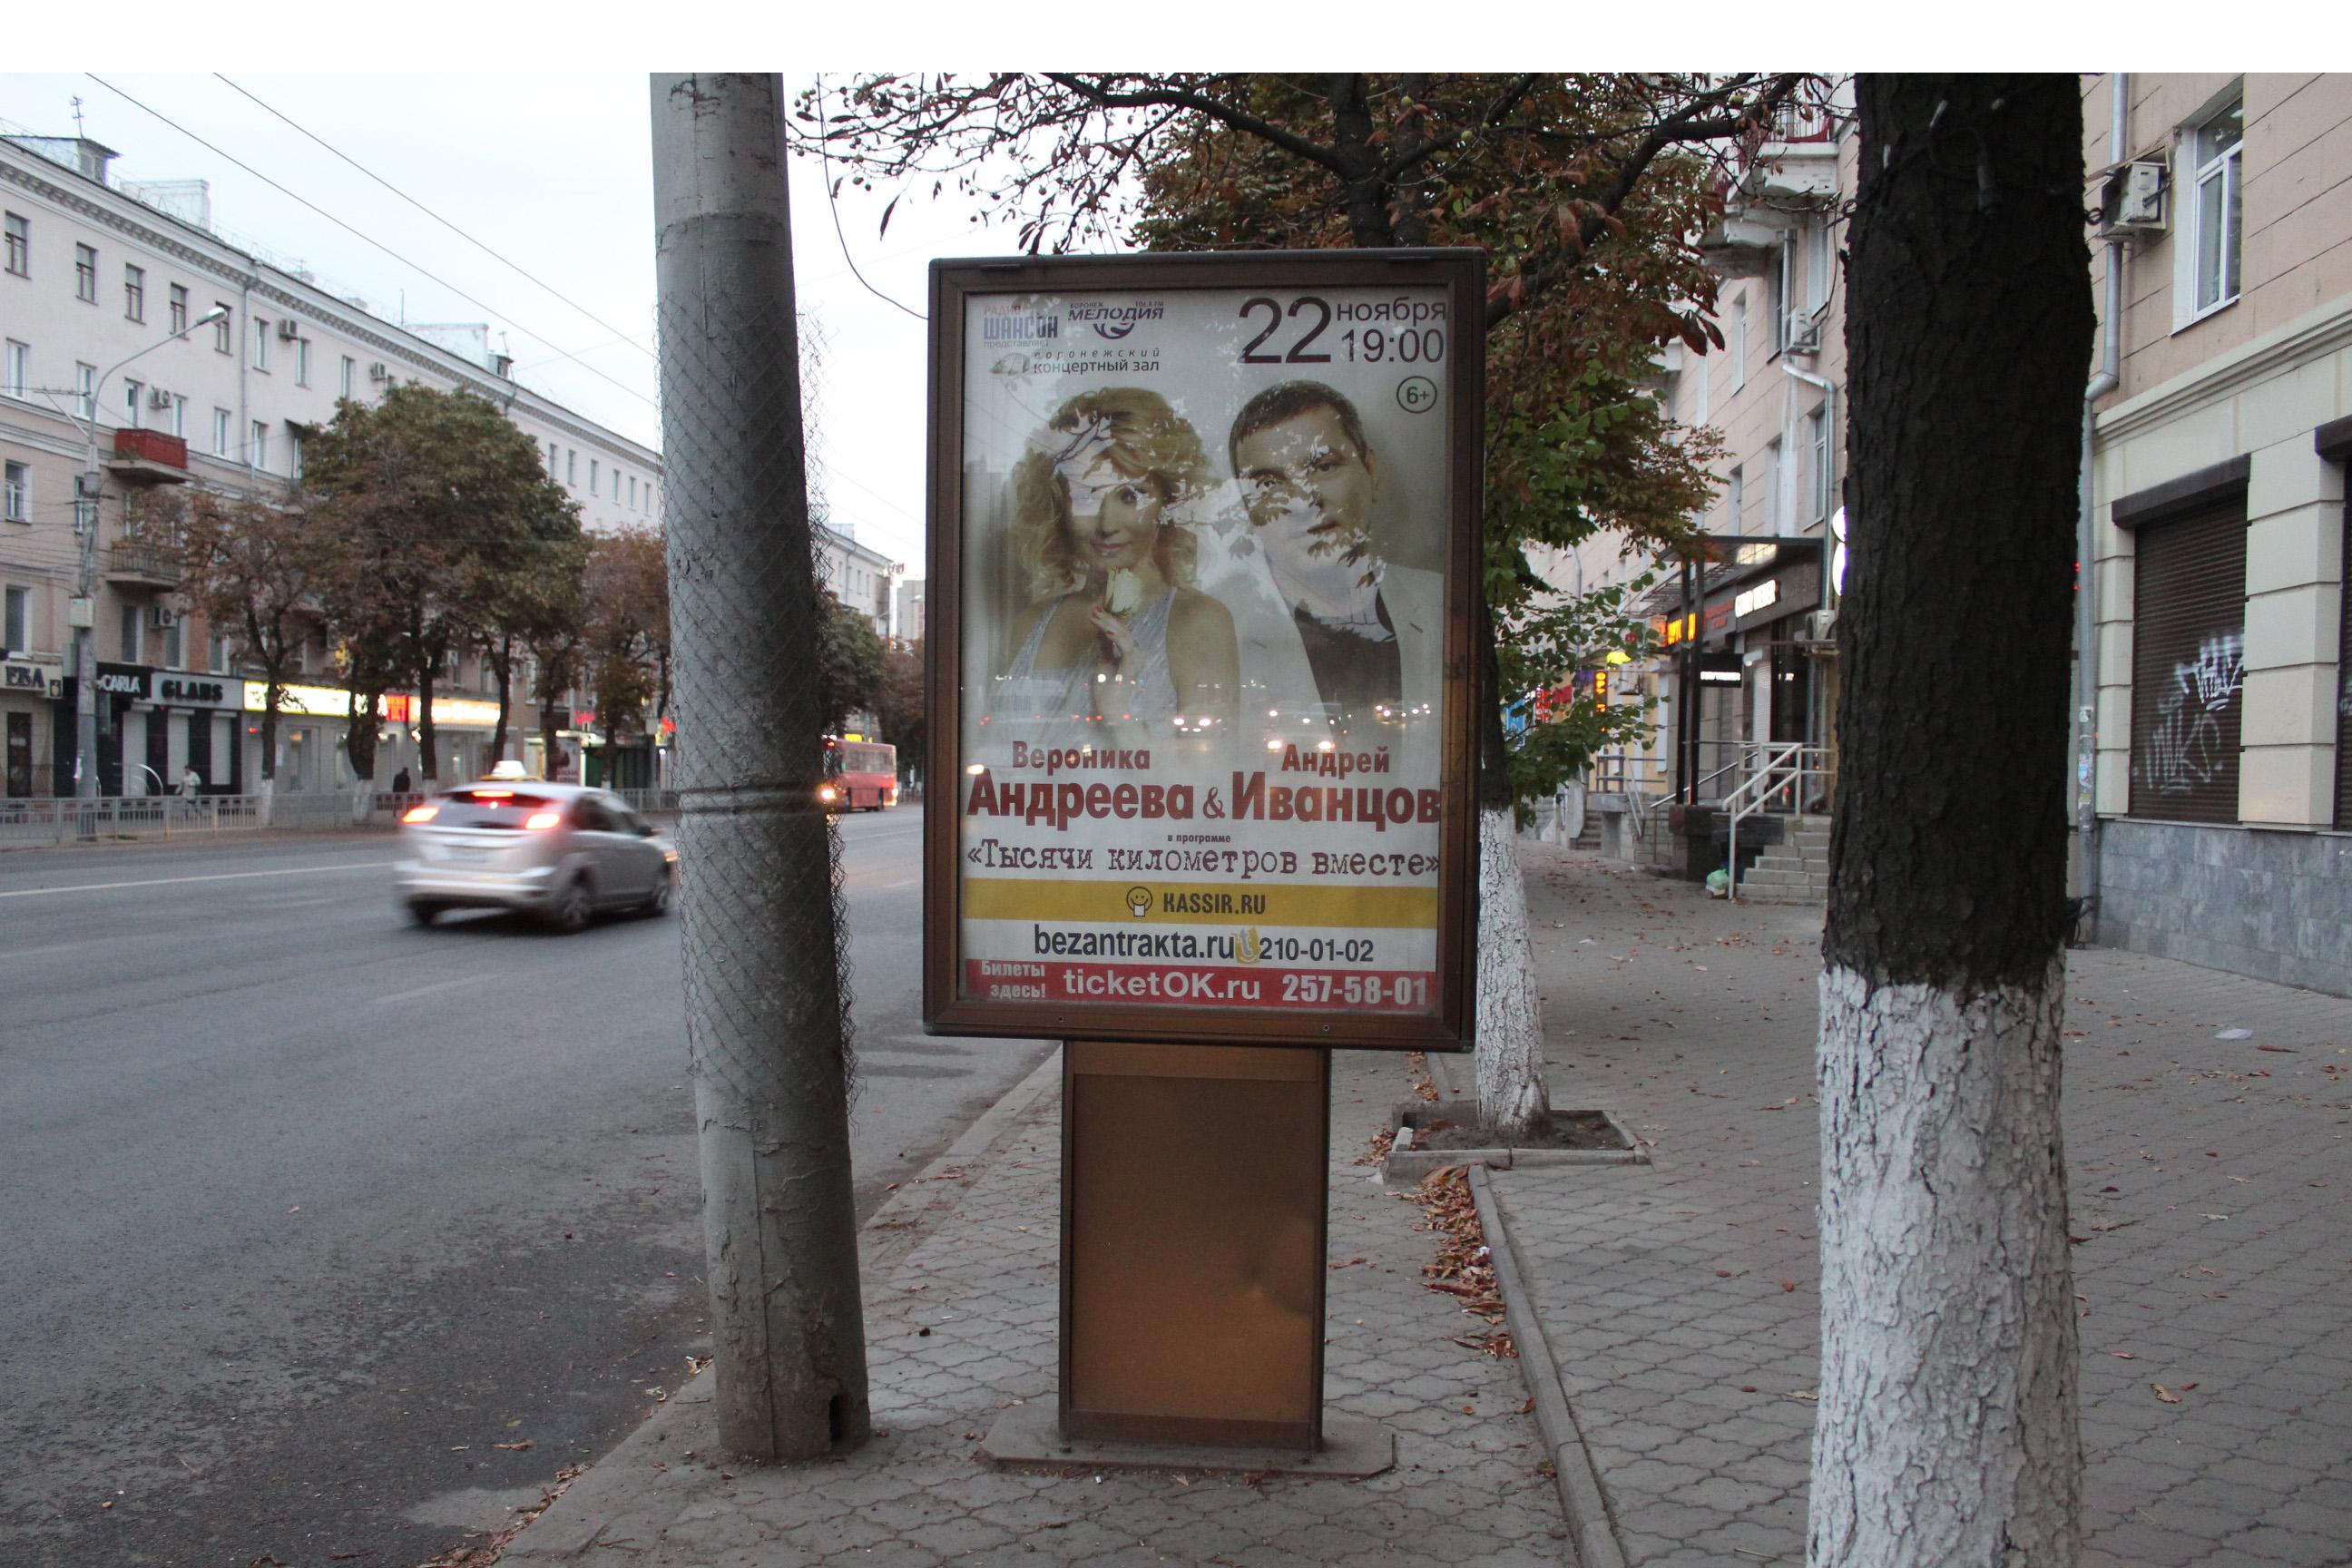 411А ул.Плехановская, 35-маг.Дет Мороз